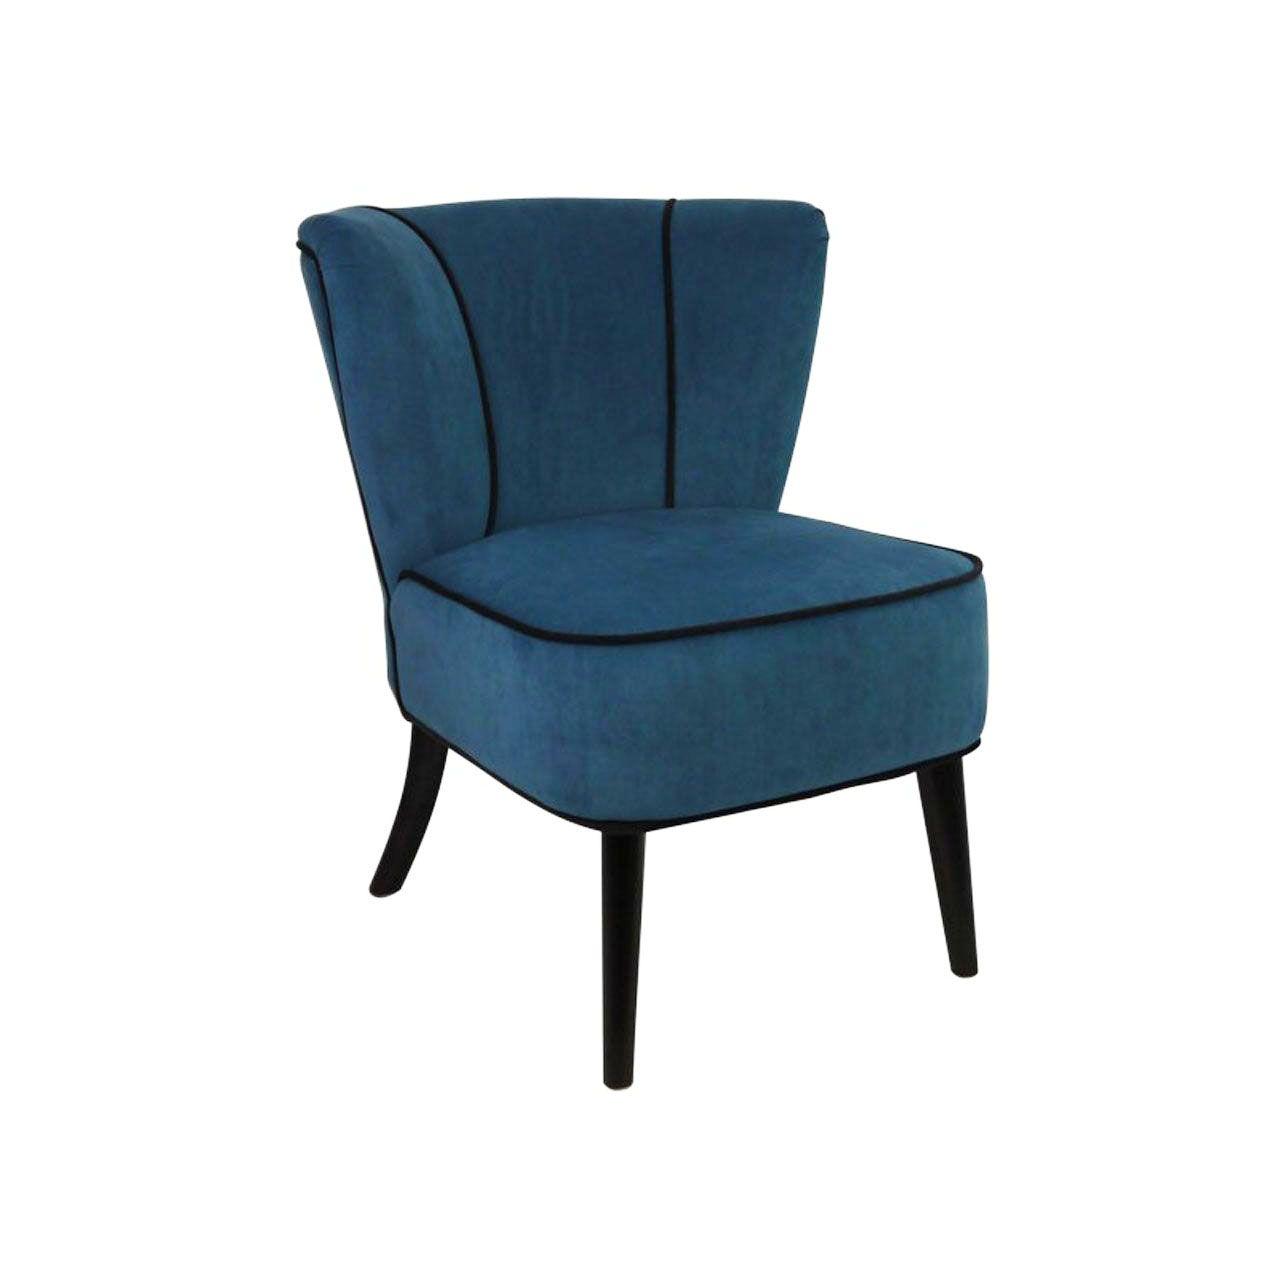 fauteuil crapaud bleu p trole aspect velours so skin. Black Bedroom Furniture Sets. Home Design Ideas